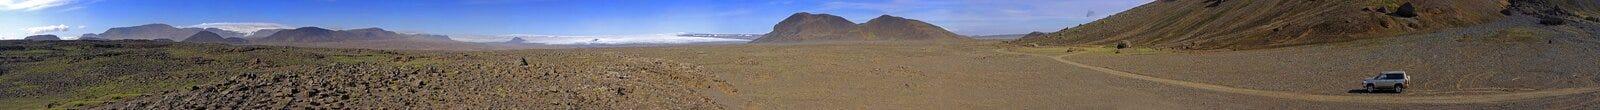 Hiodufell volcanic landscape Stock Image